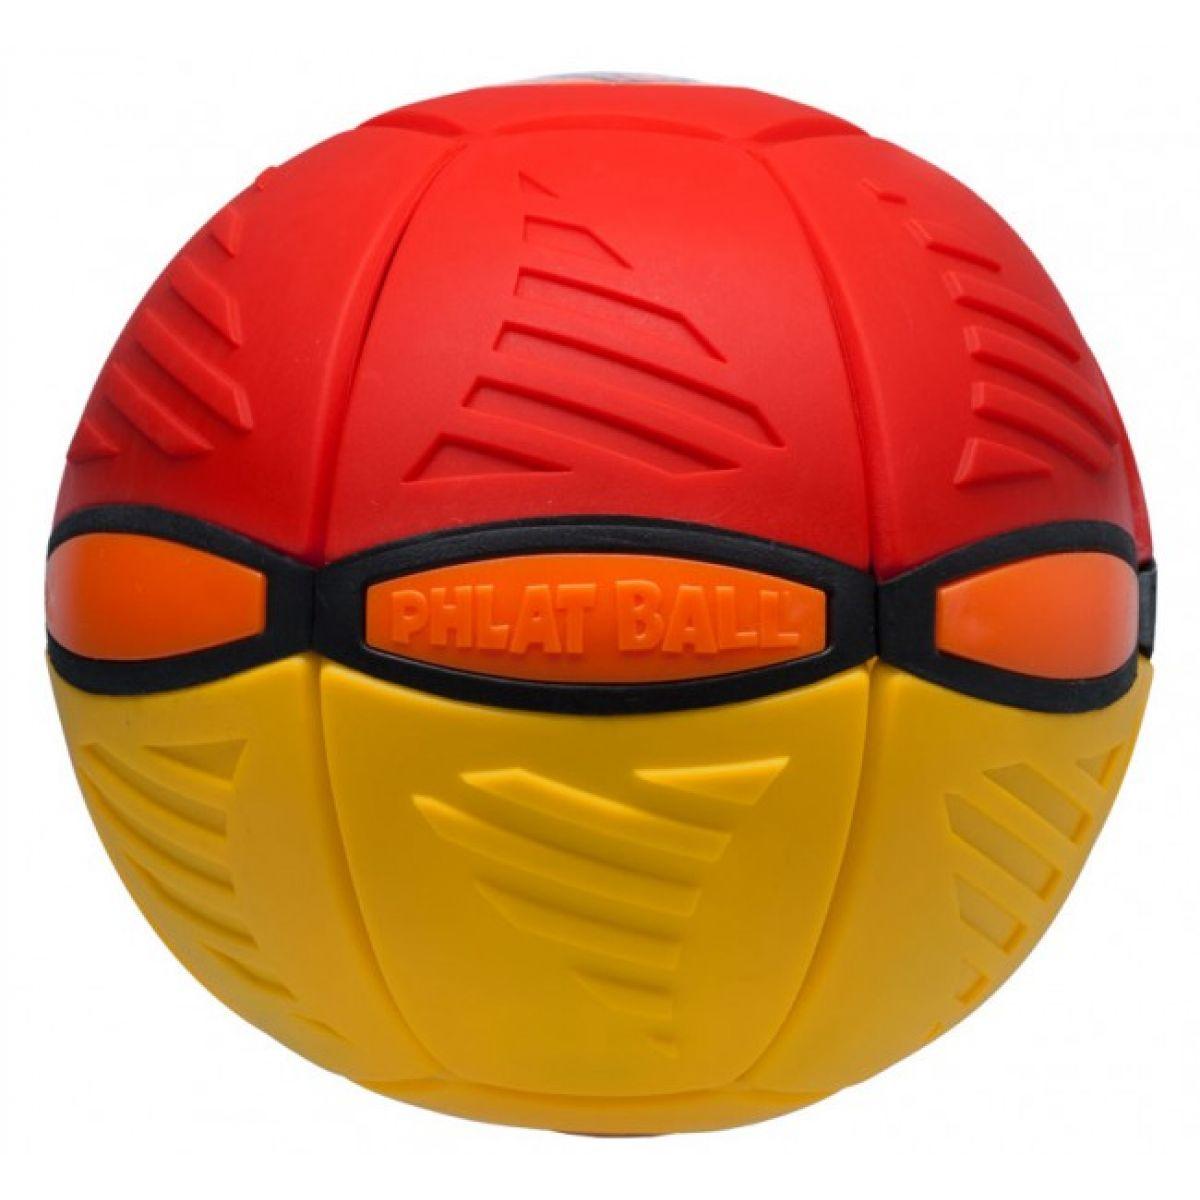 Phlat Ball V3 - Červeno-žltá